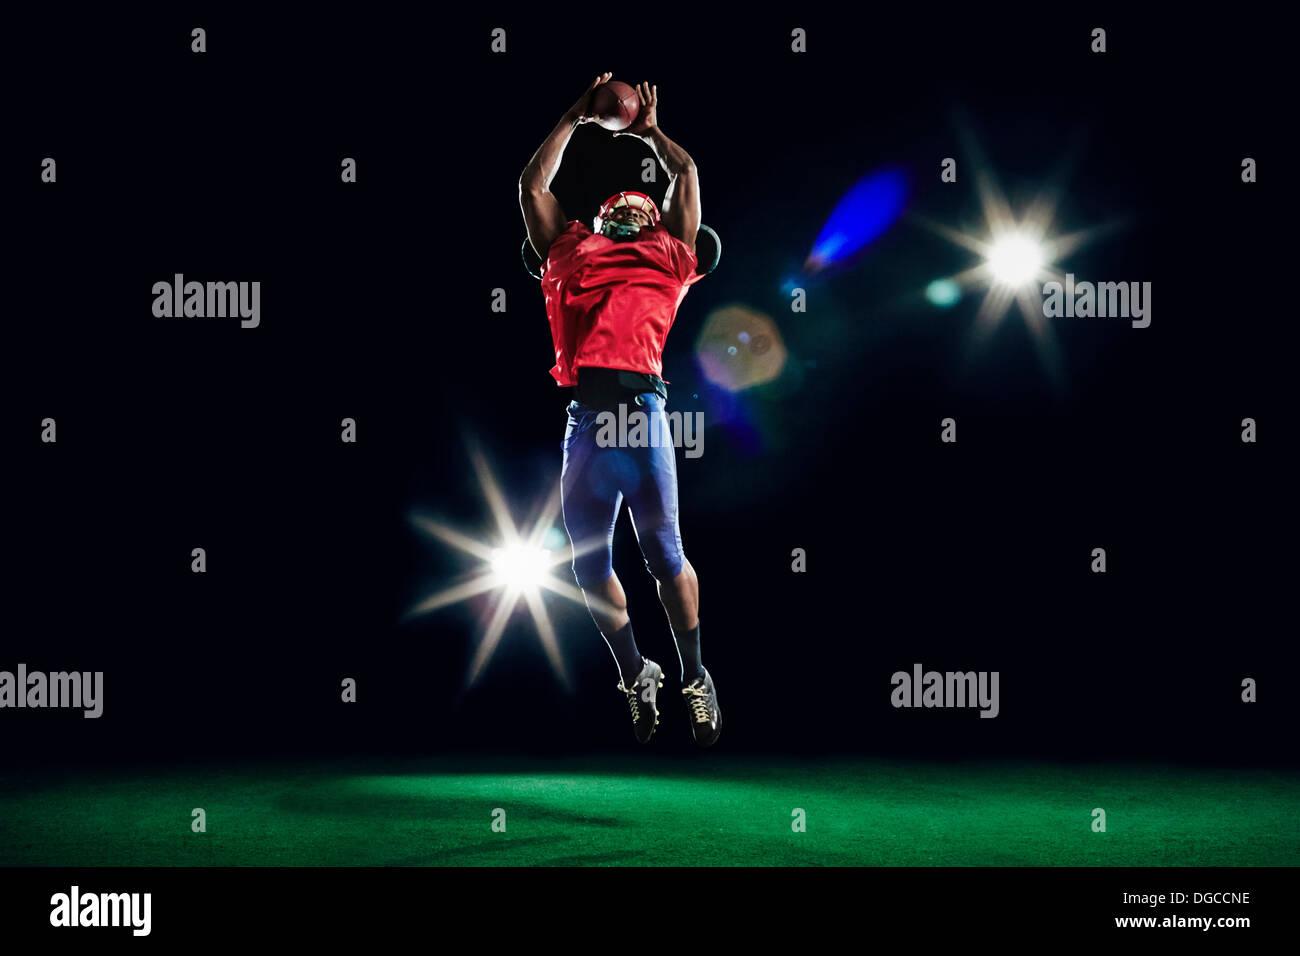 American football player catching ball Photo Stock